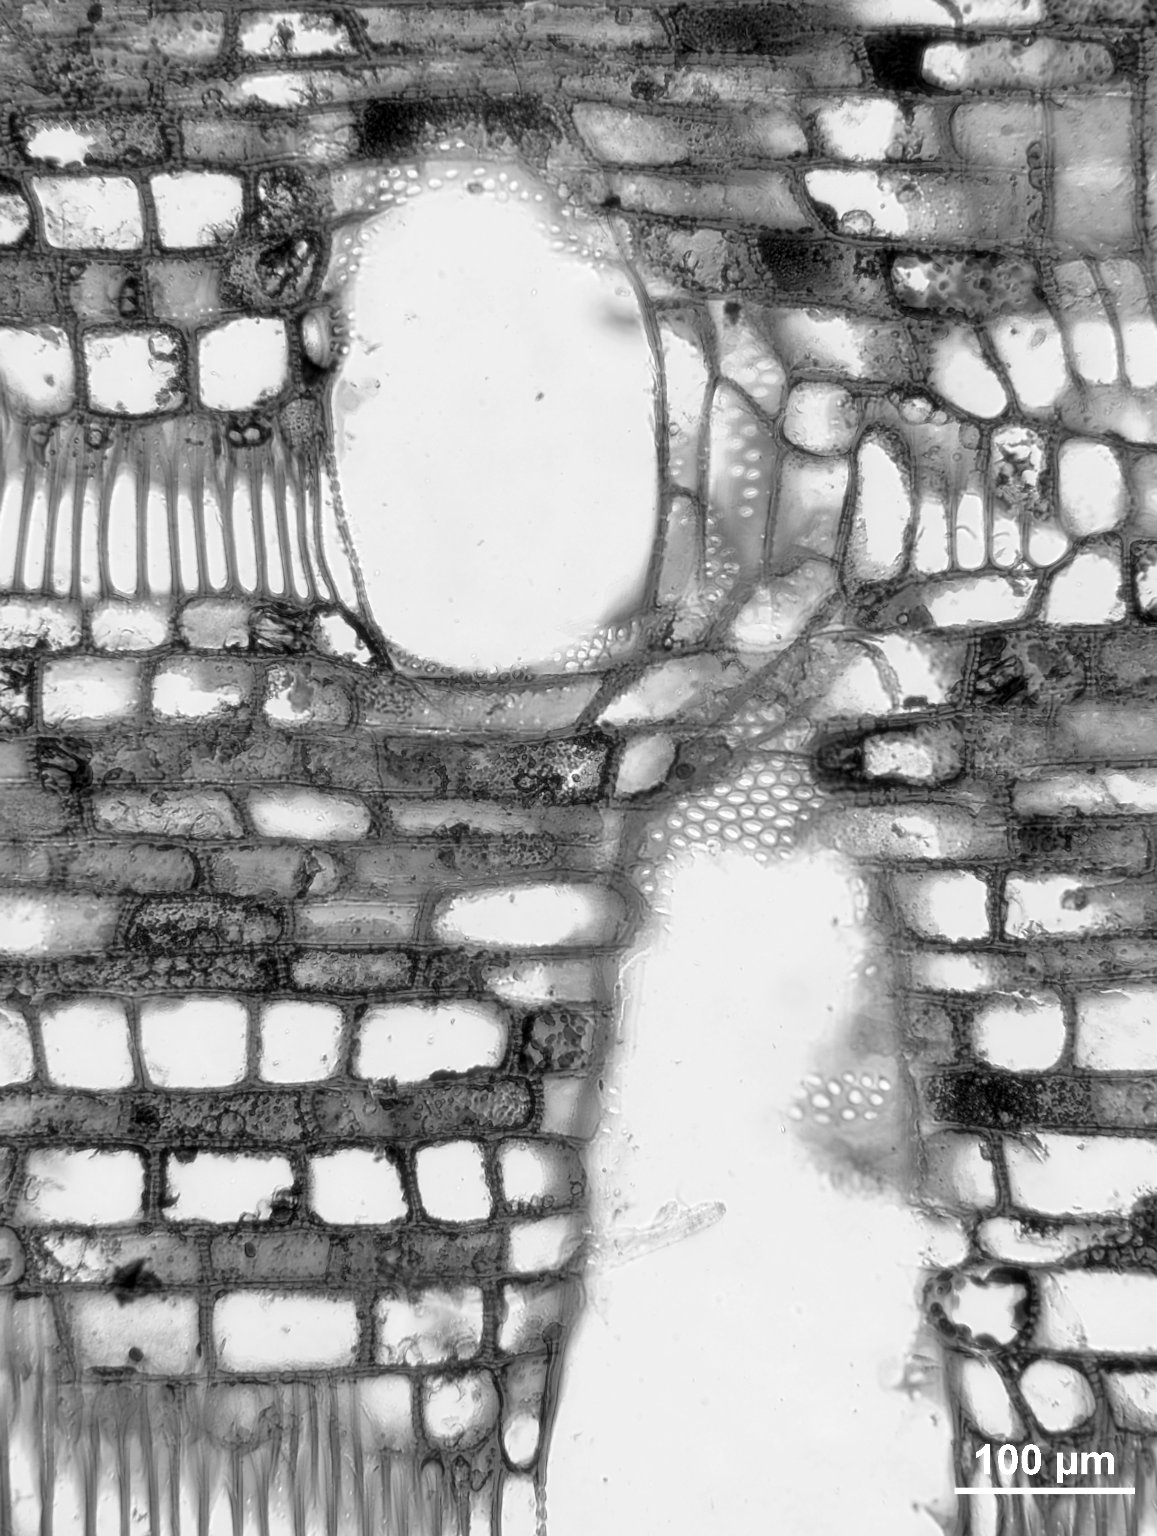 SABIACEAE Meliosma macrophylla